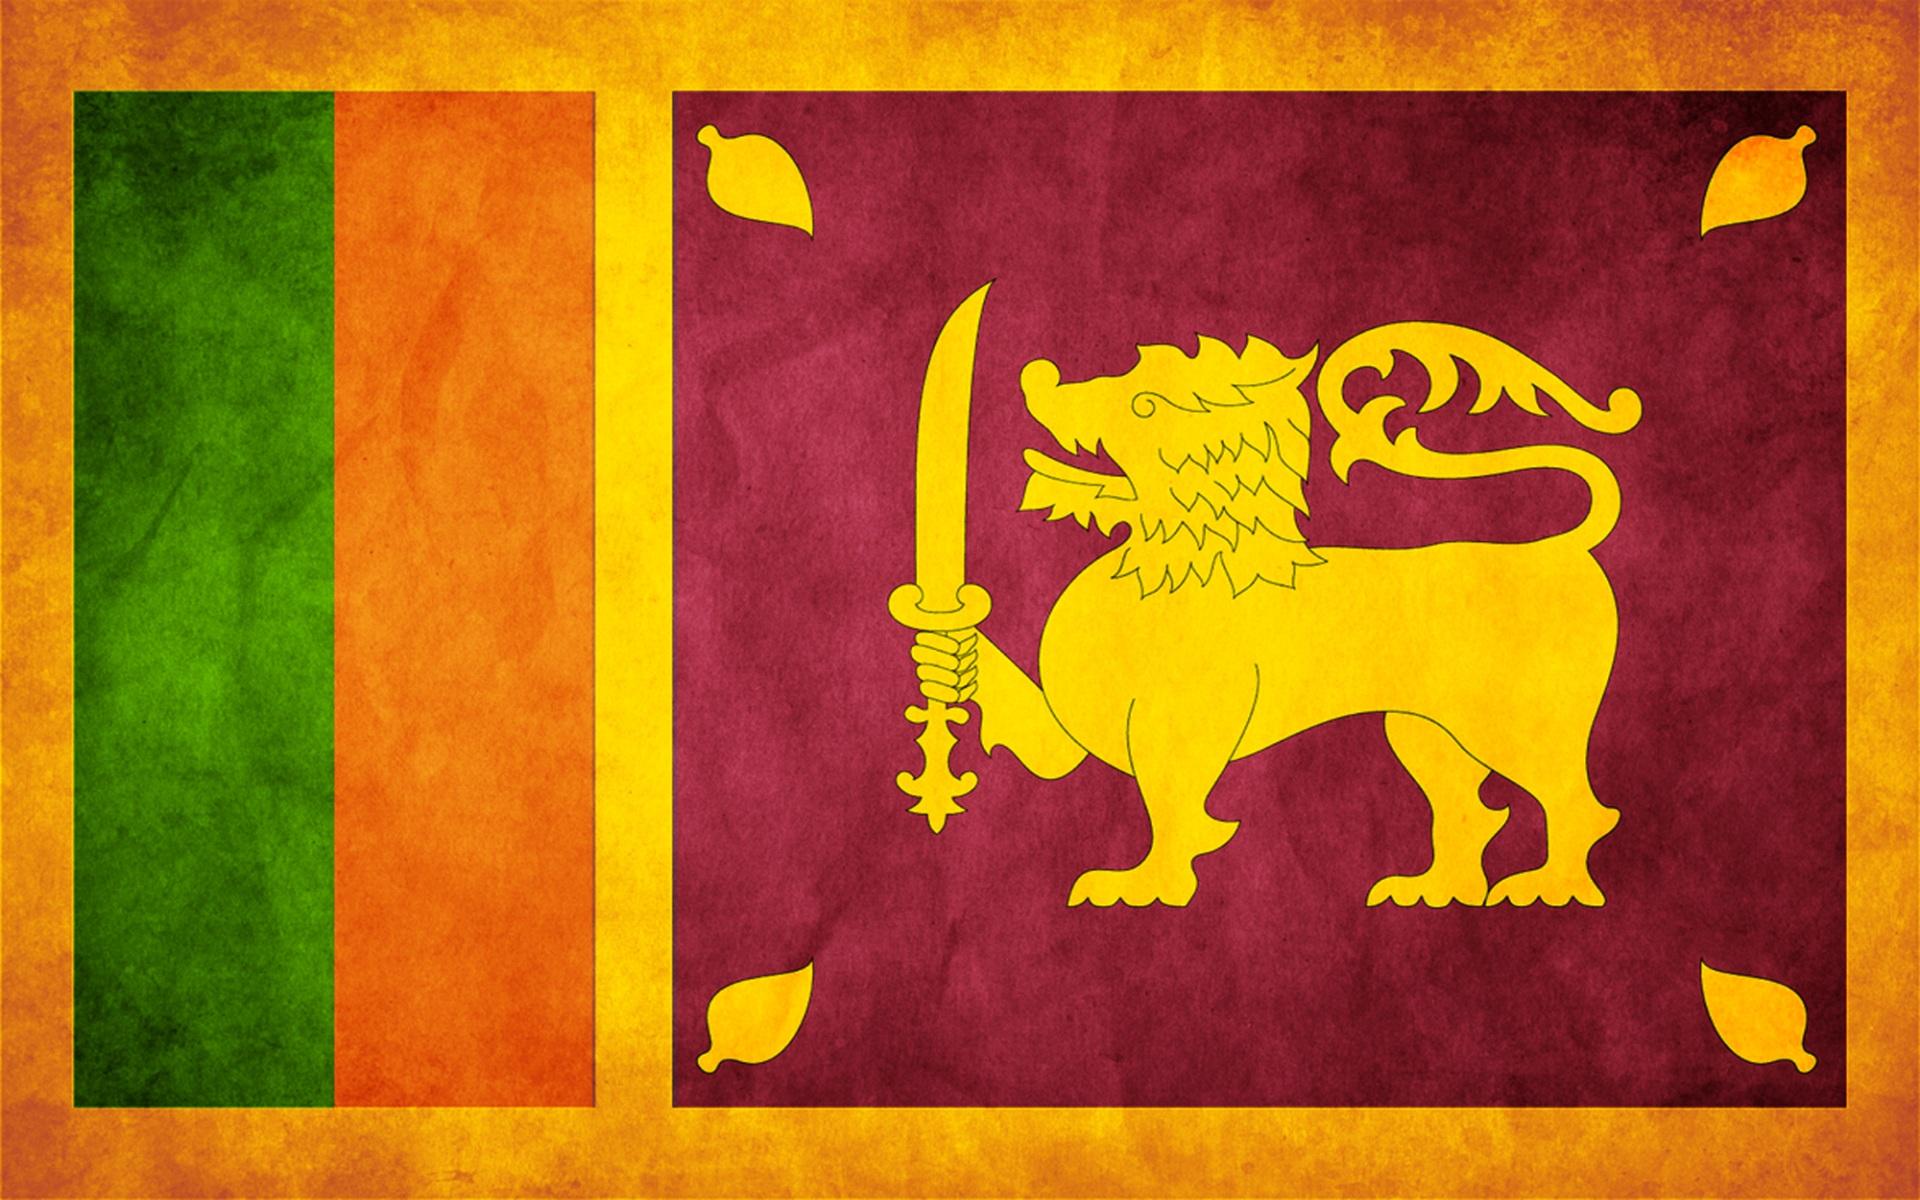 sri-lanka-flag-hd-wallpapers